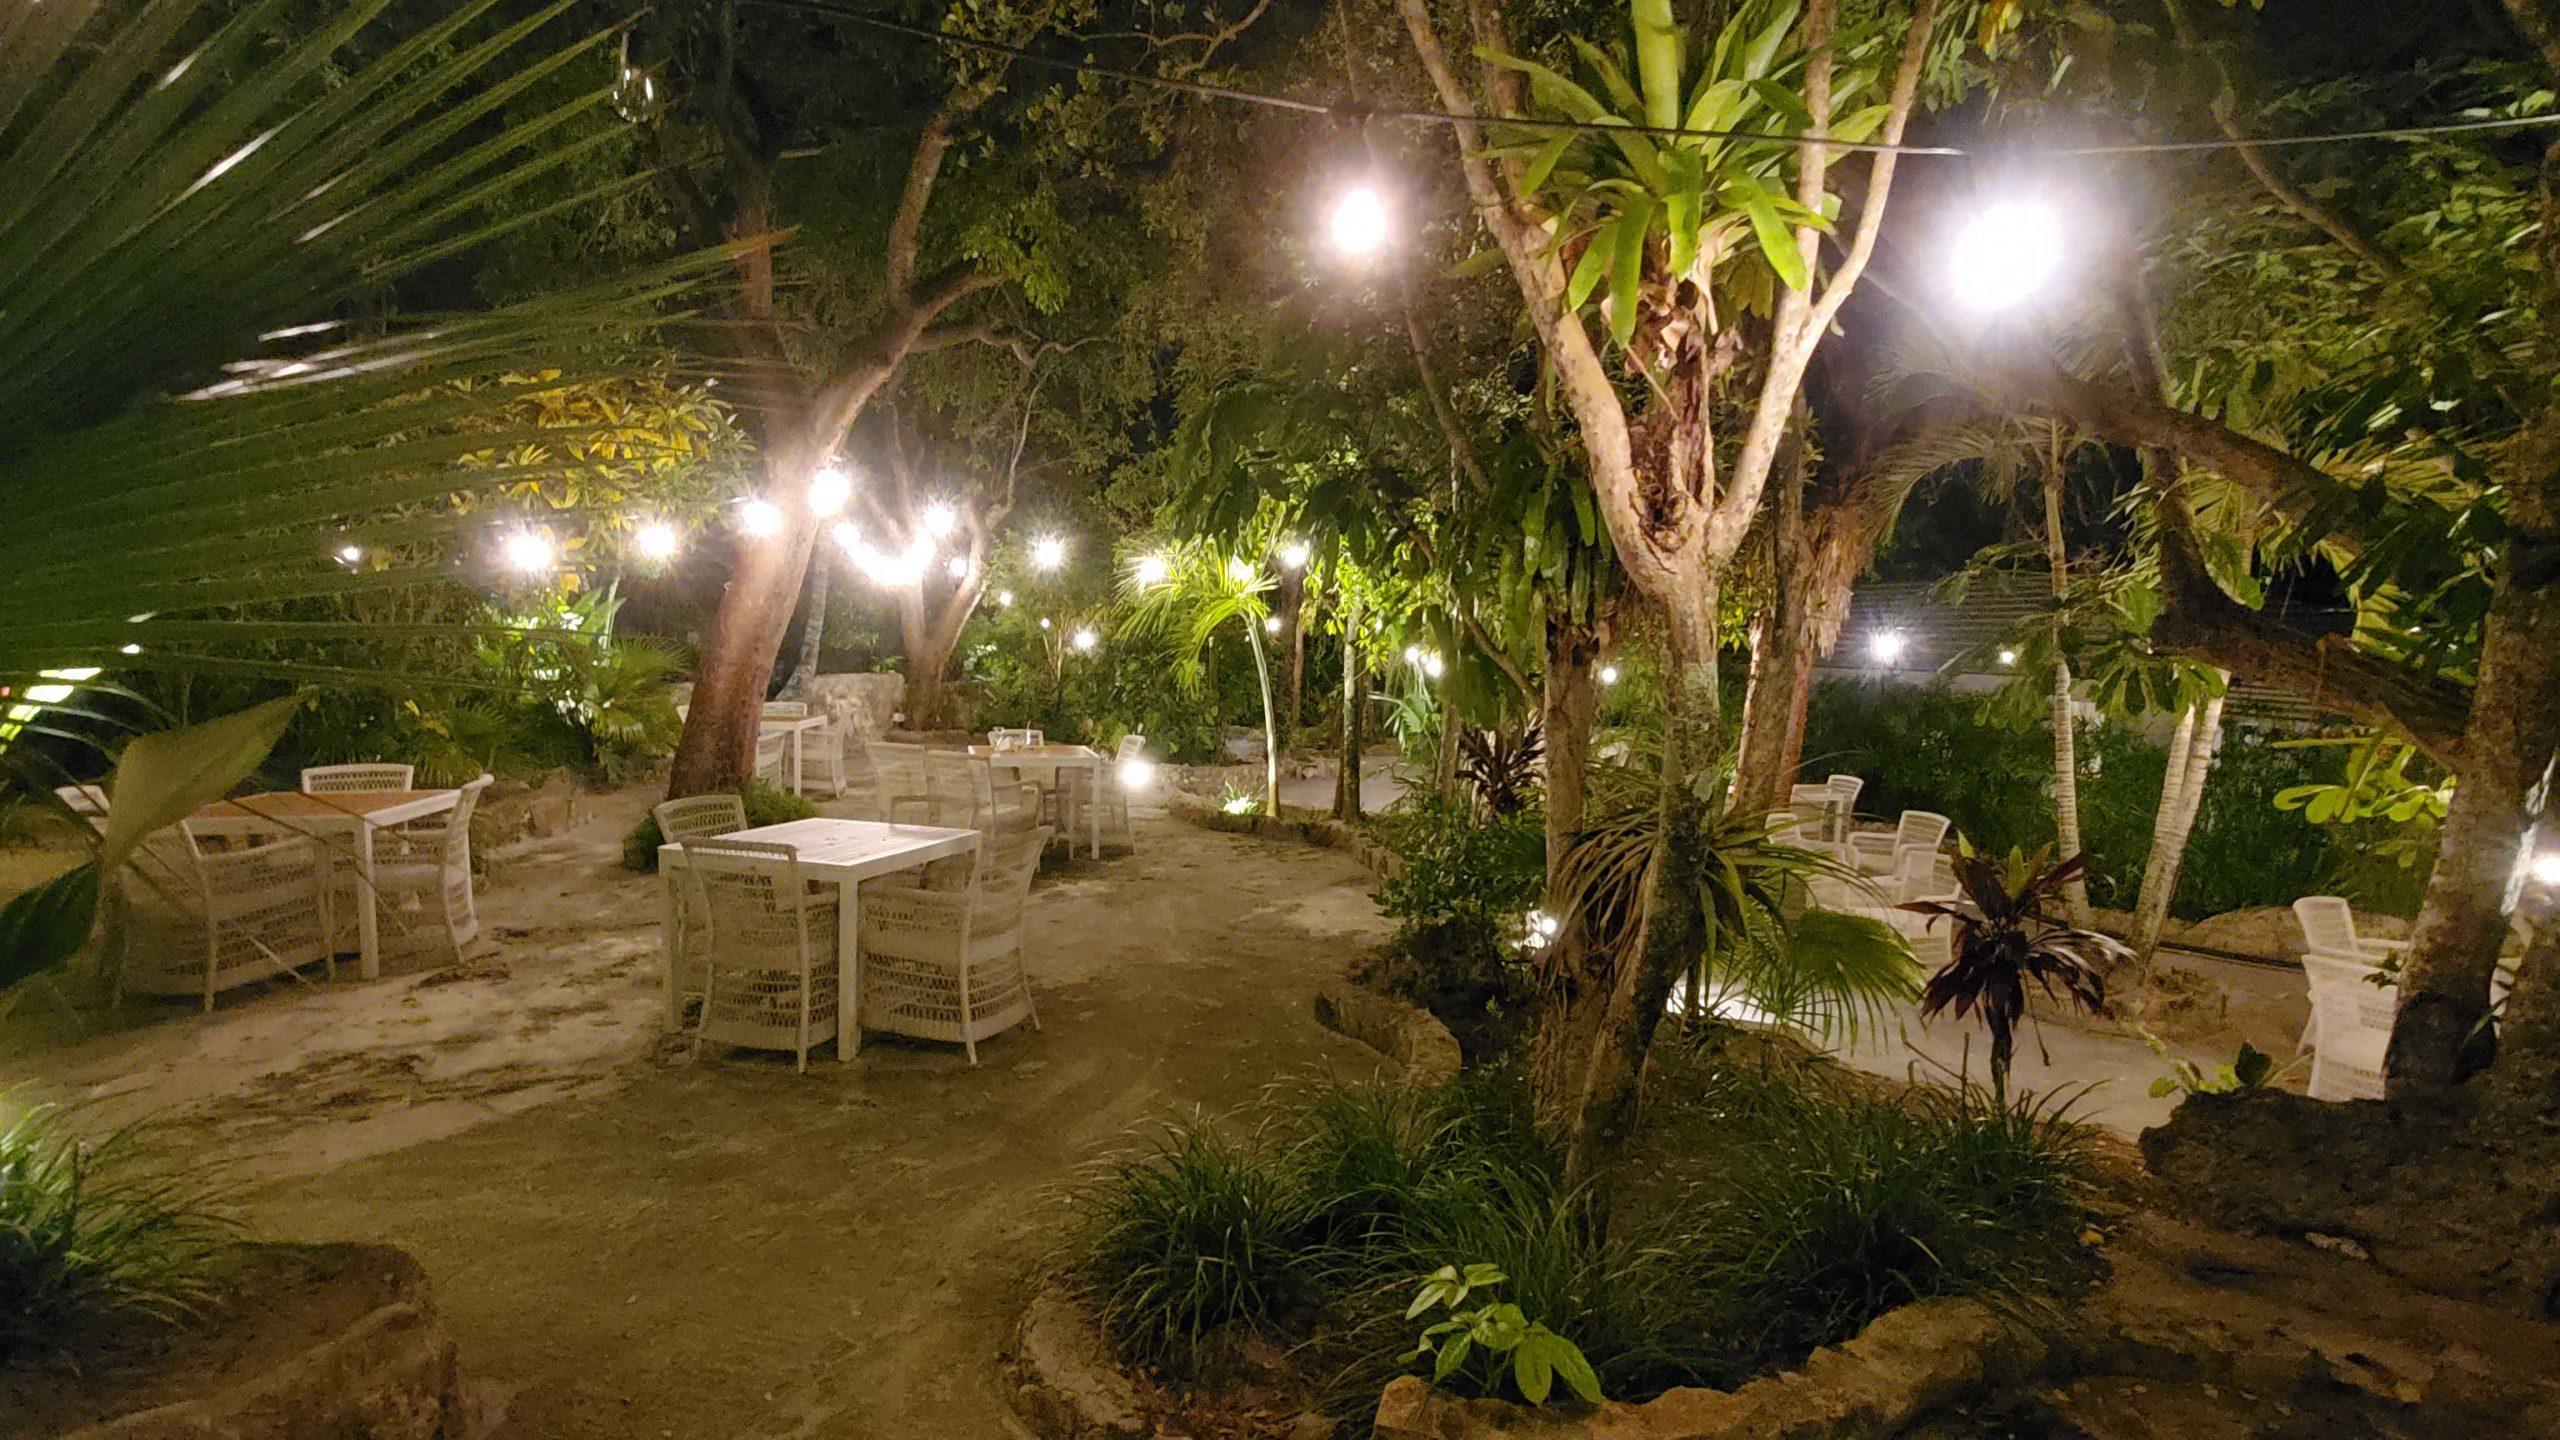 07-2021-Briland-Club-Marina-Restaurant-at-Night